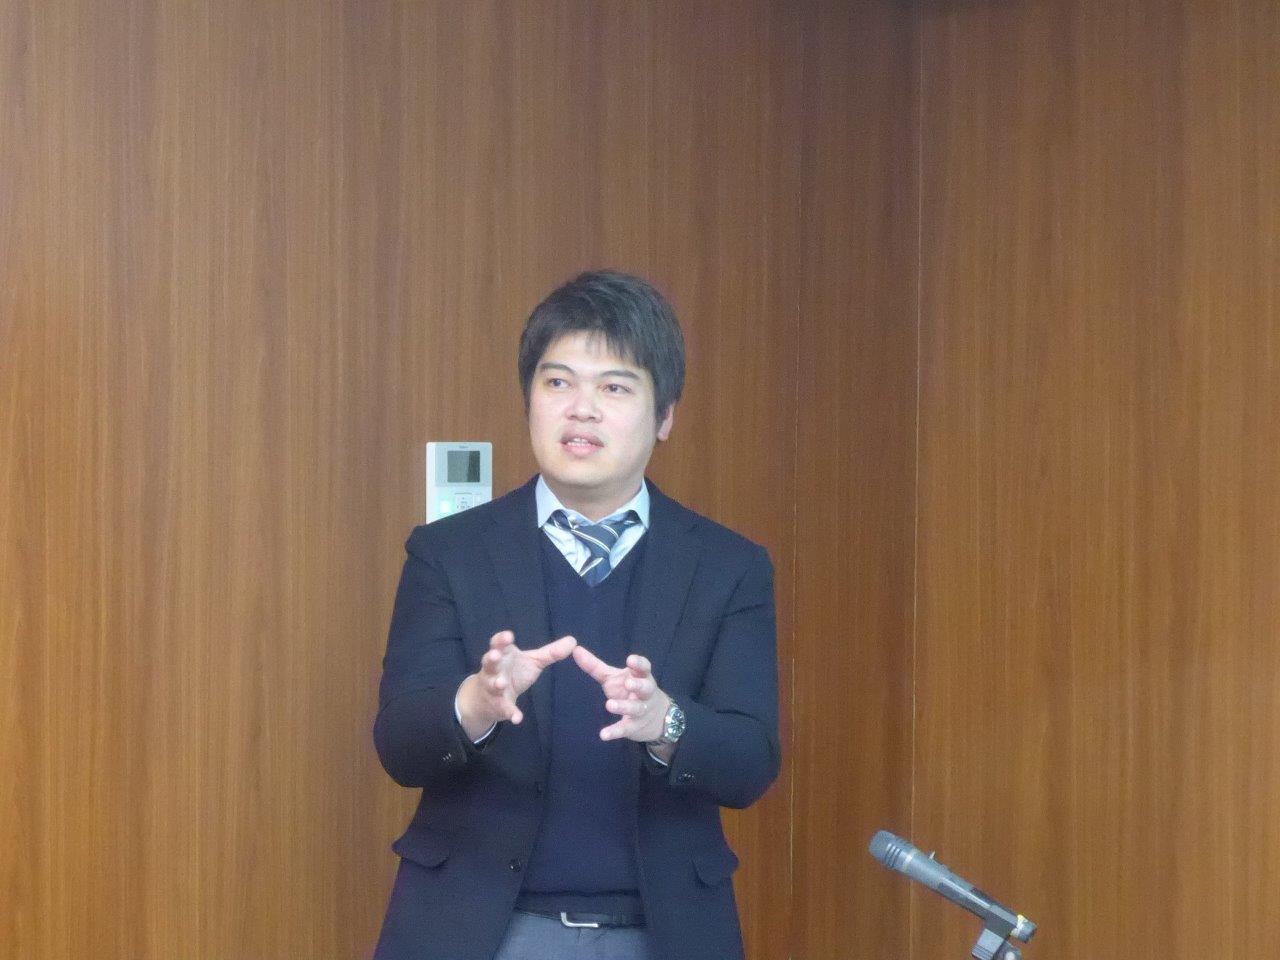 http://rcisss.ier.hit-u.ac.jp/Japanese/micro/information/about/micro/P1040624.jpg